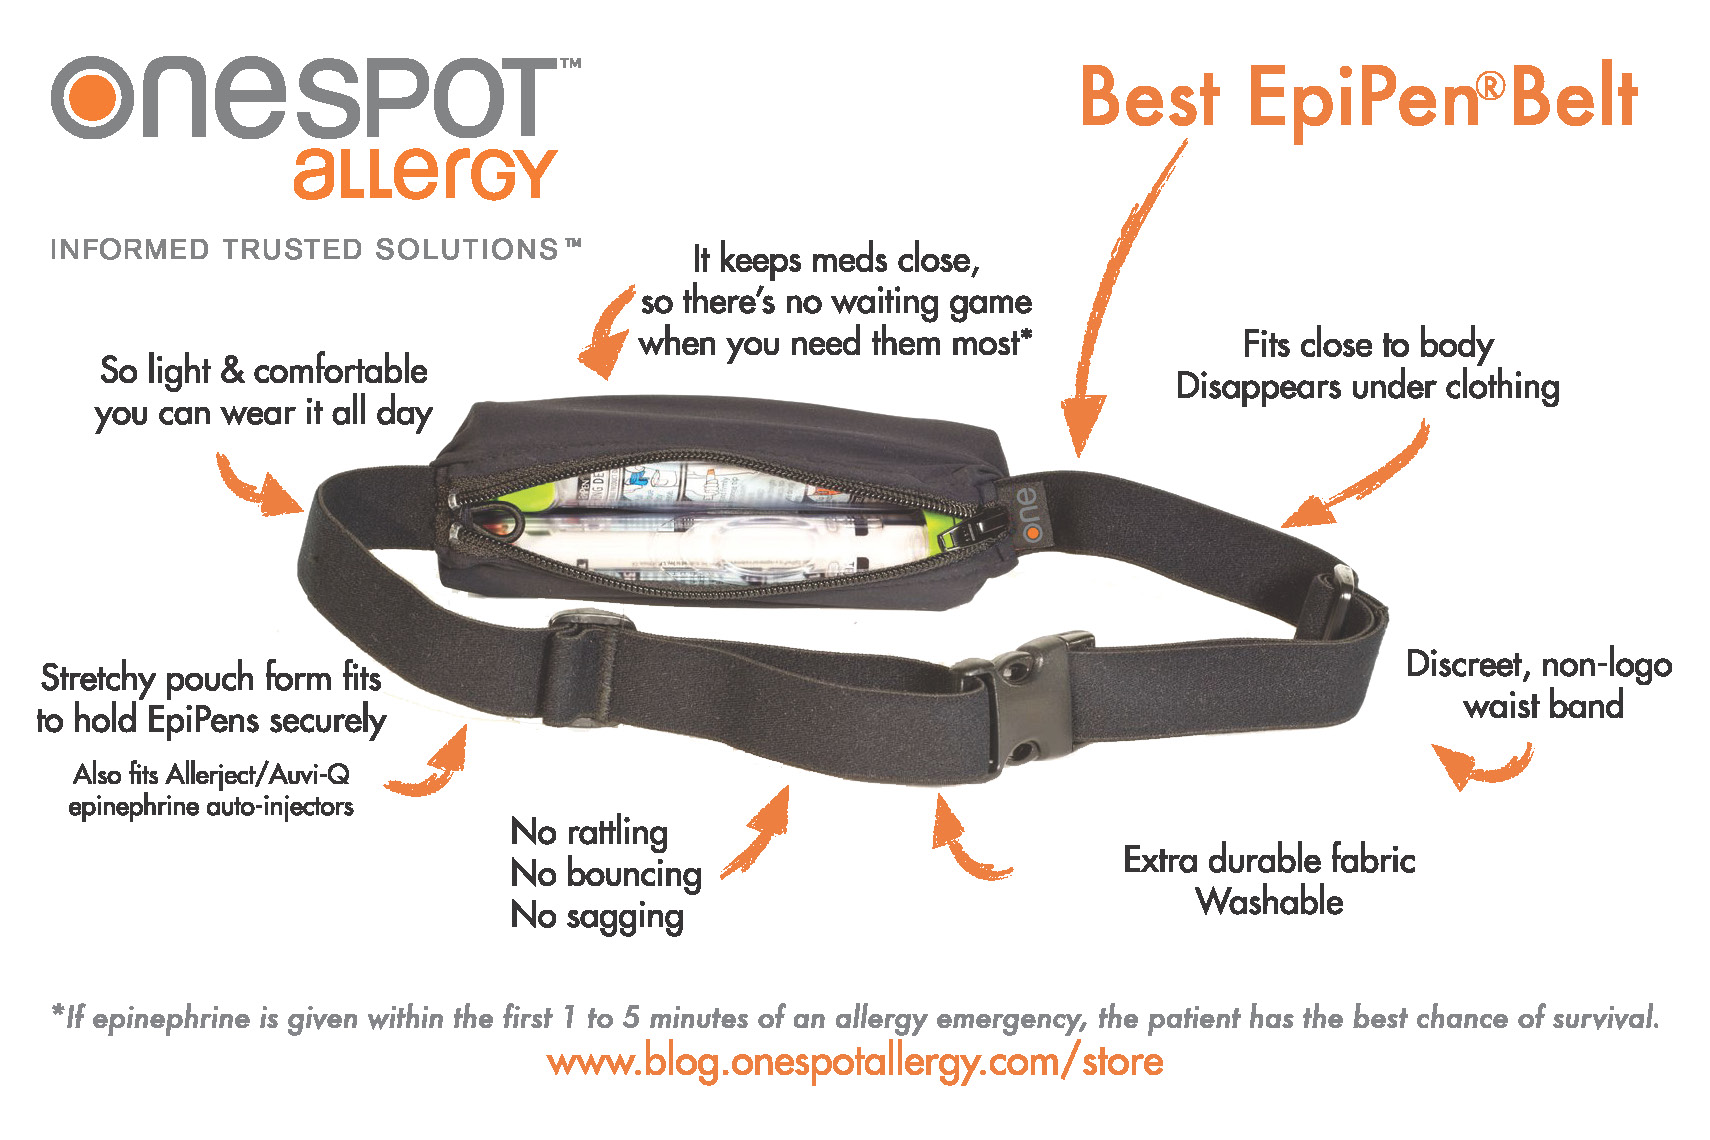 Best EpiPen Belt Onespot Allergy Image